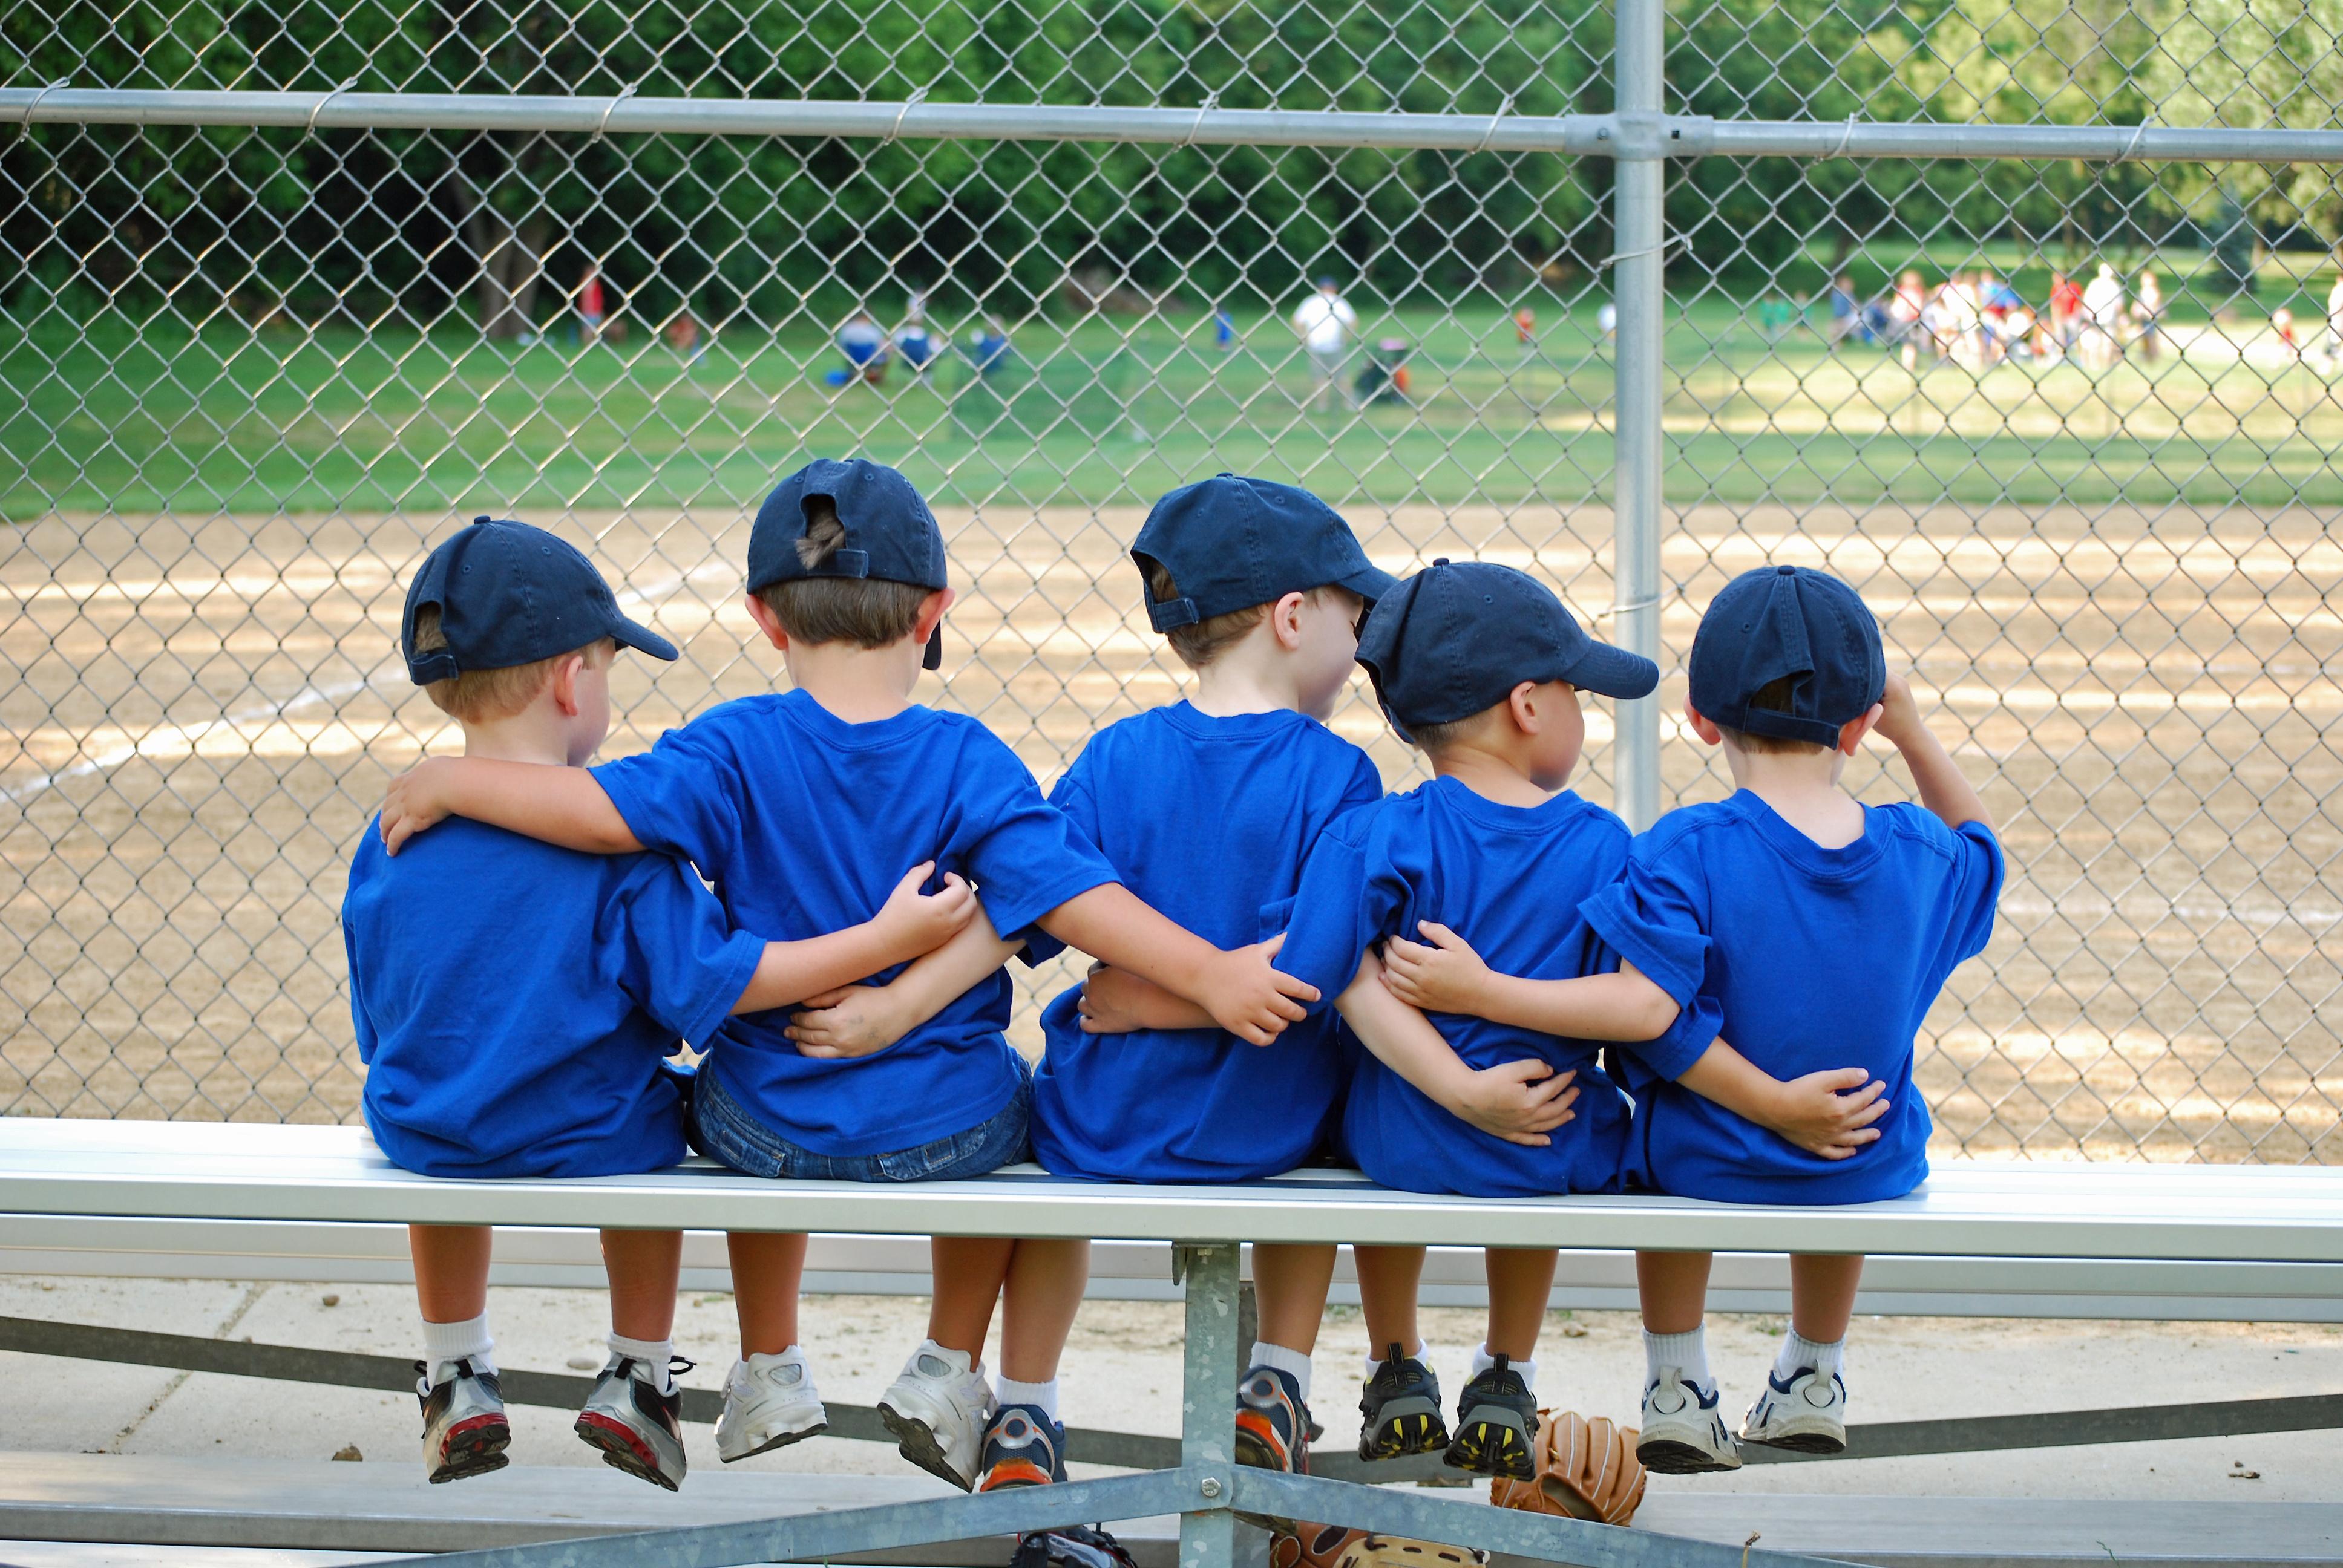 jim lefebvre baseball backyard baseball baseball training